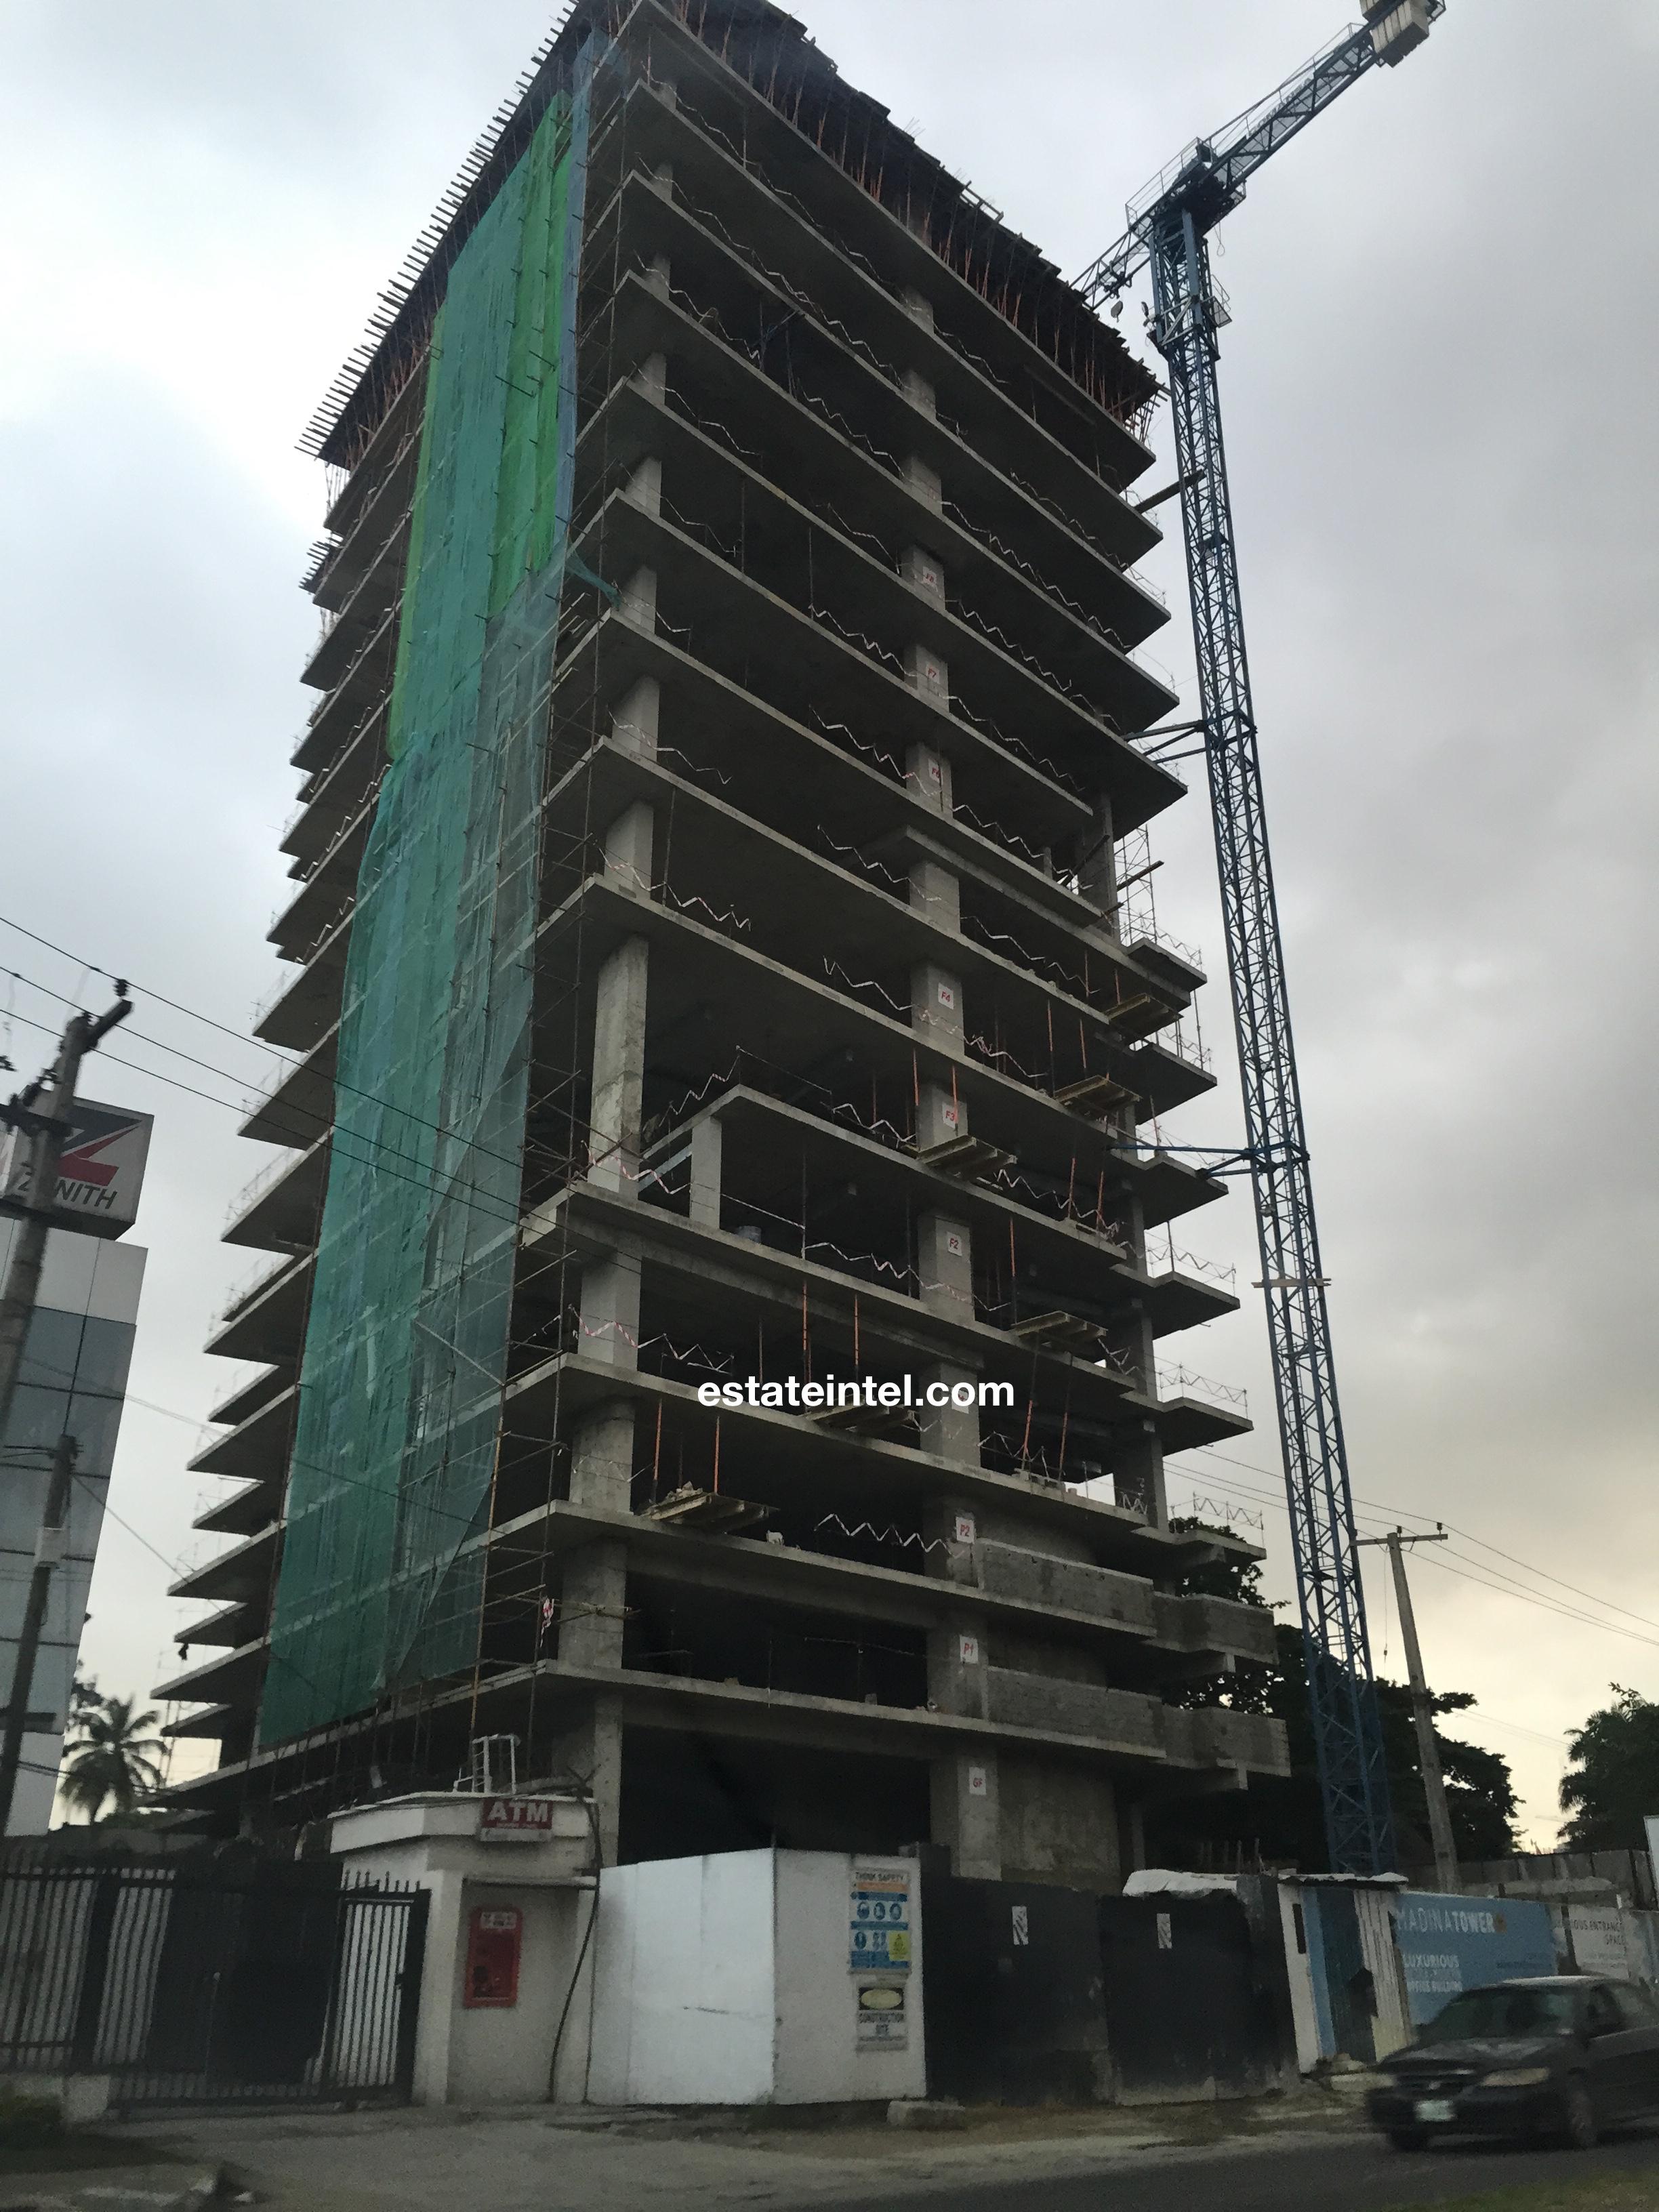 Madina Tower, July 2015